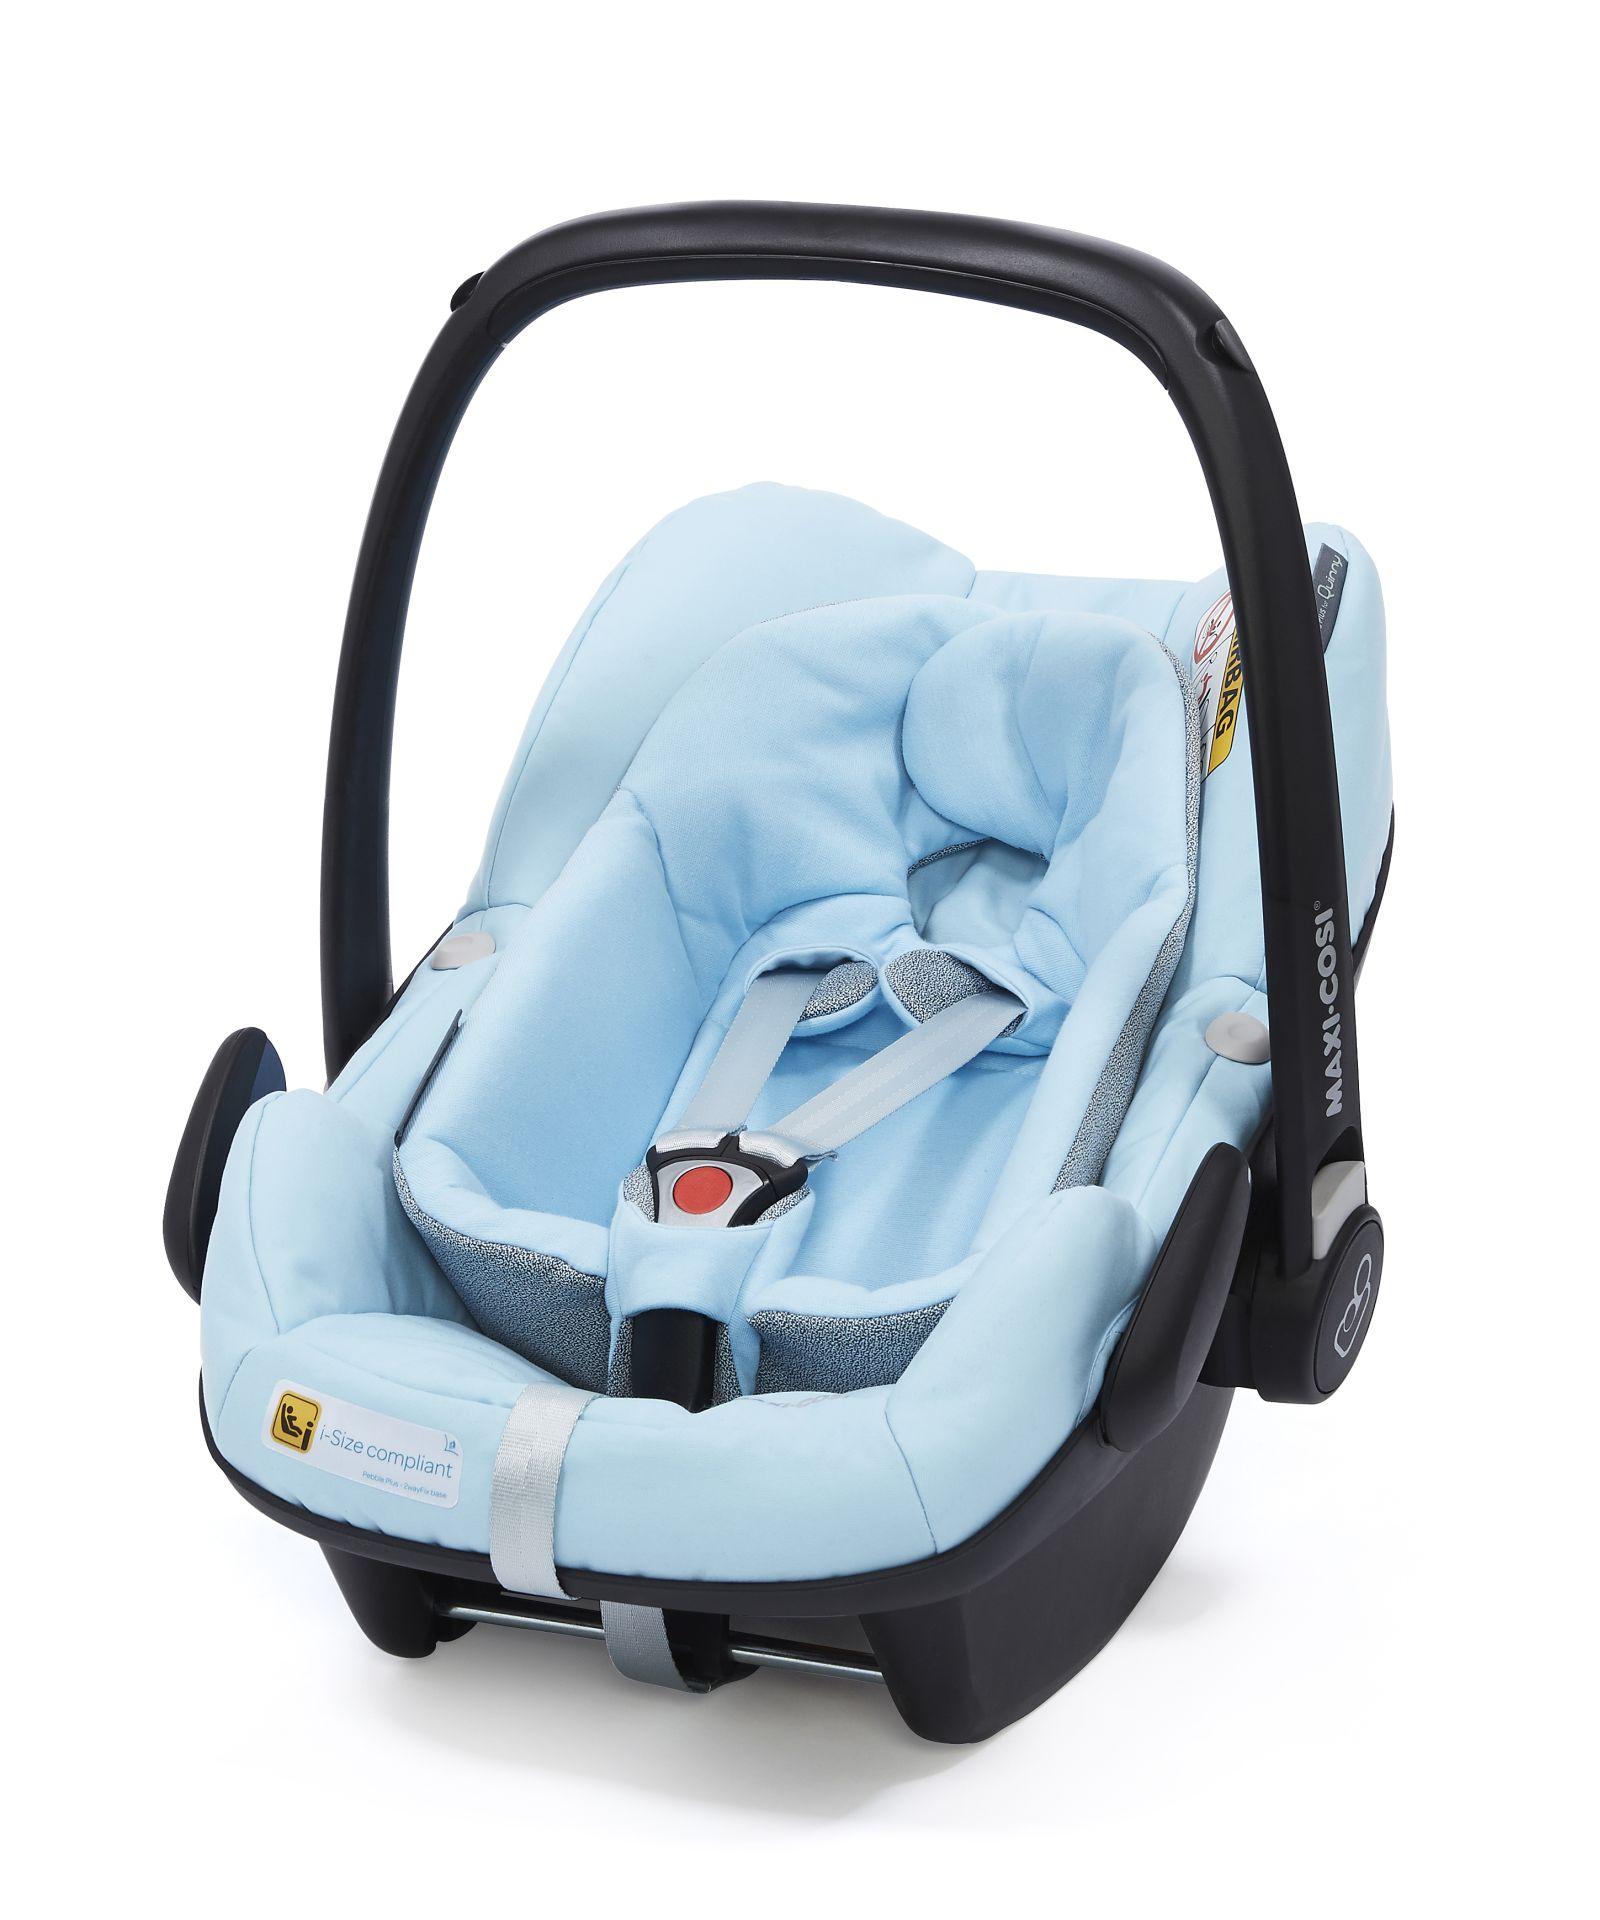 maxi cosi infant car seat pebble plus 2018 sky buy at. Black Bedroom Furniture Sets. Home Design Ideas